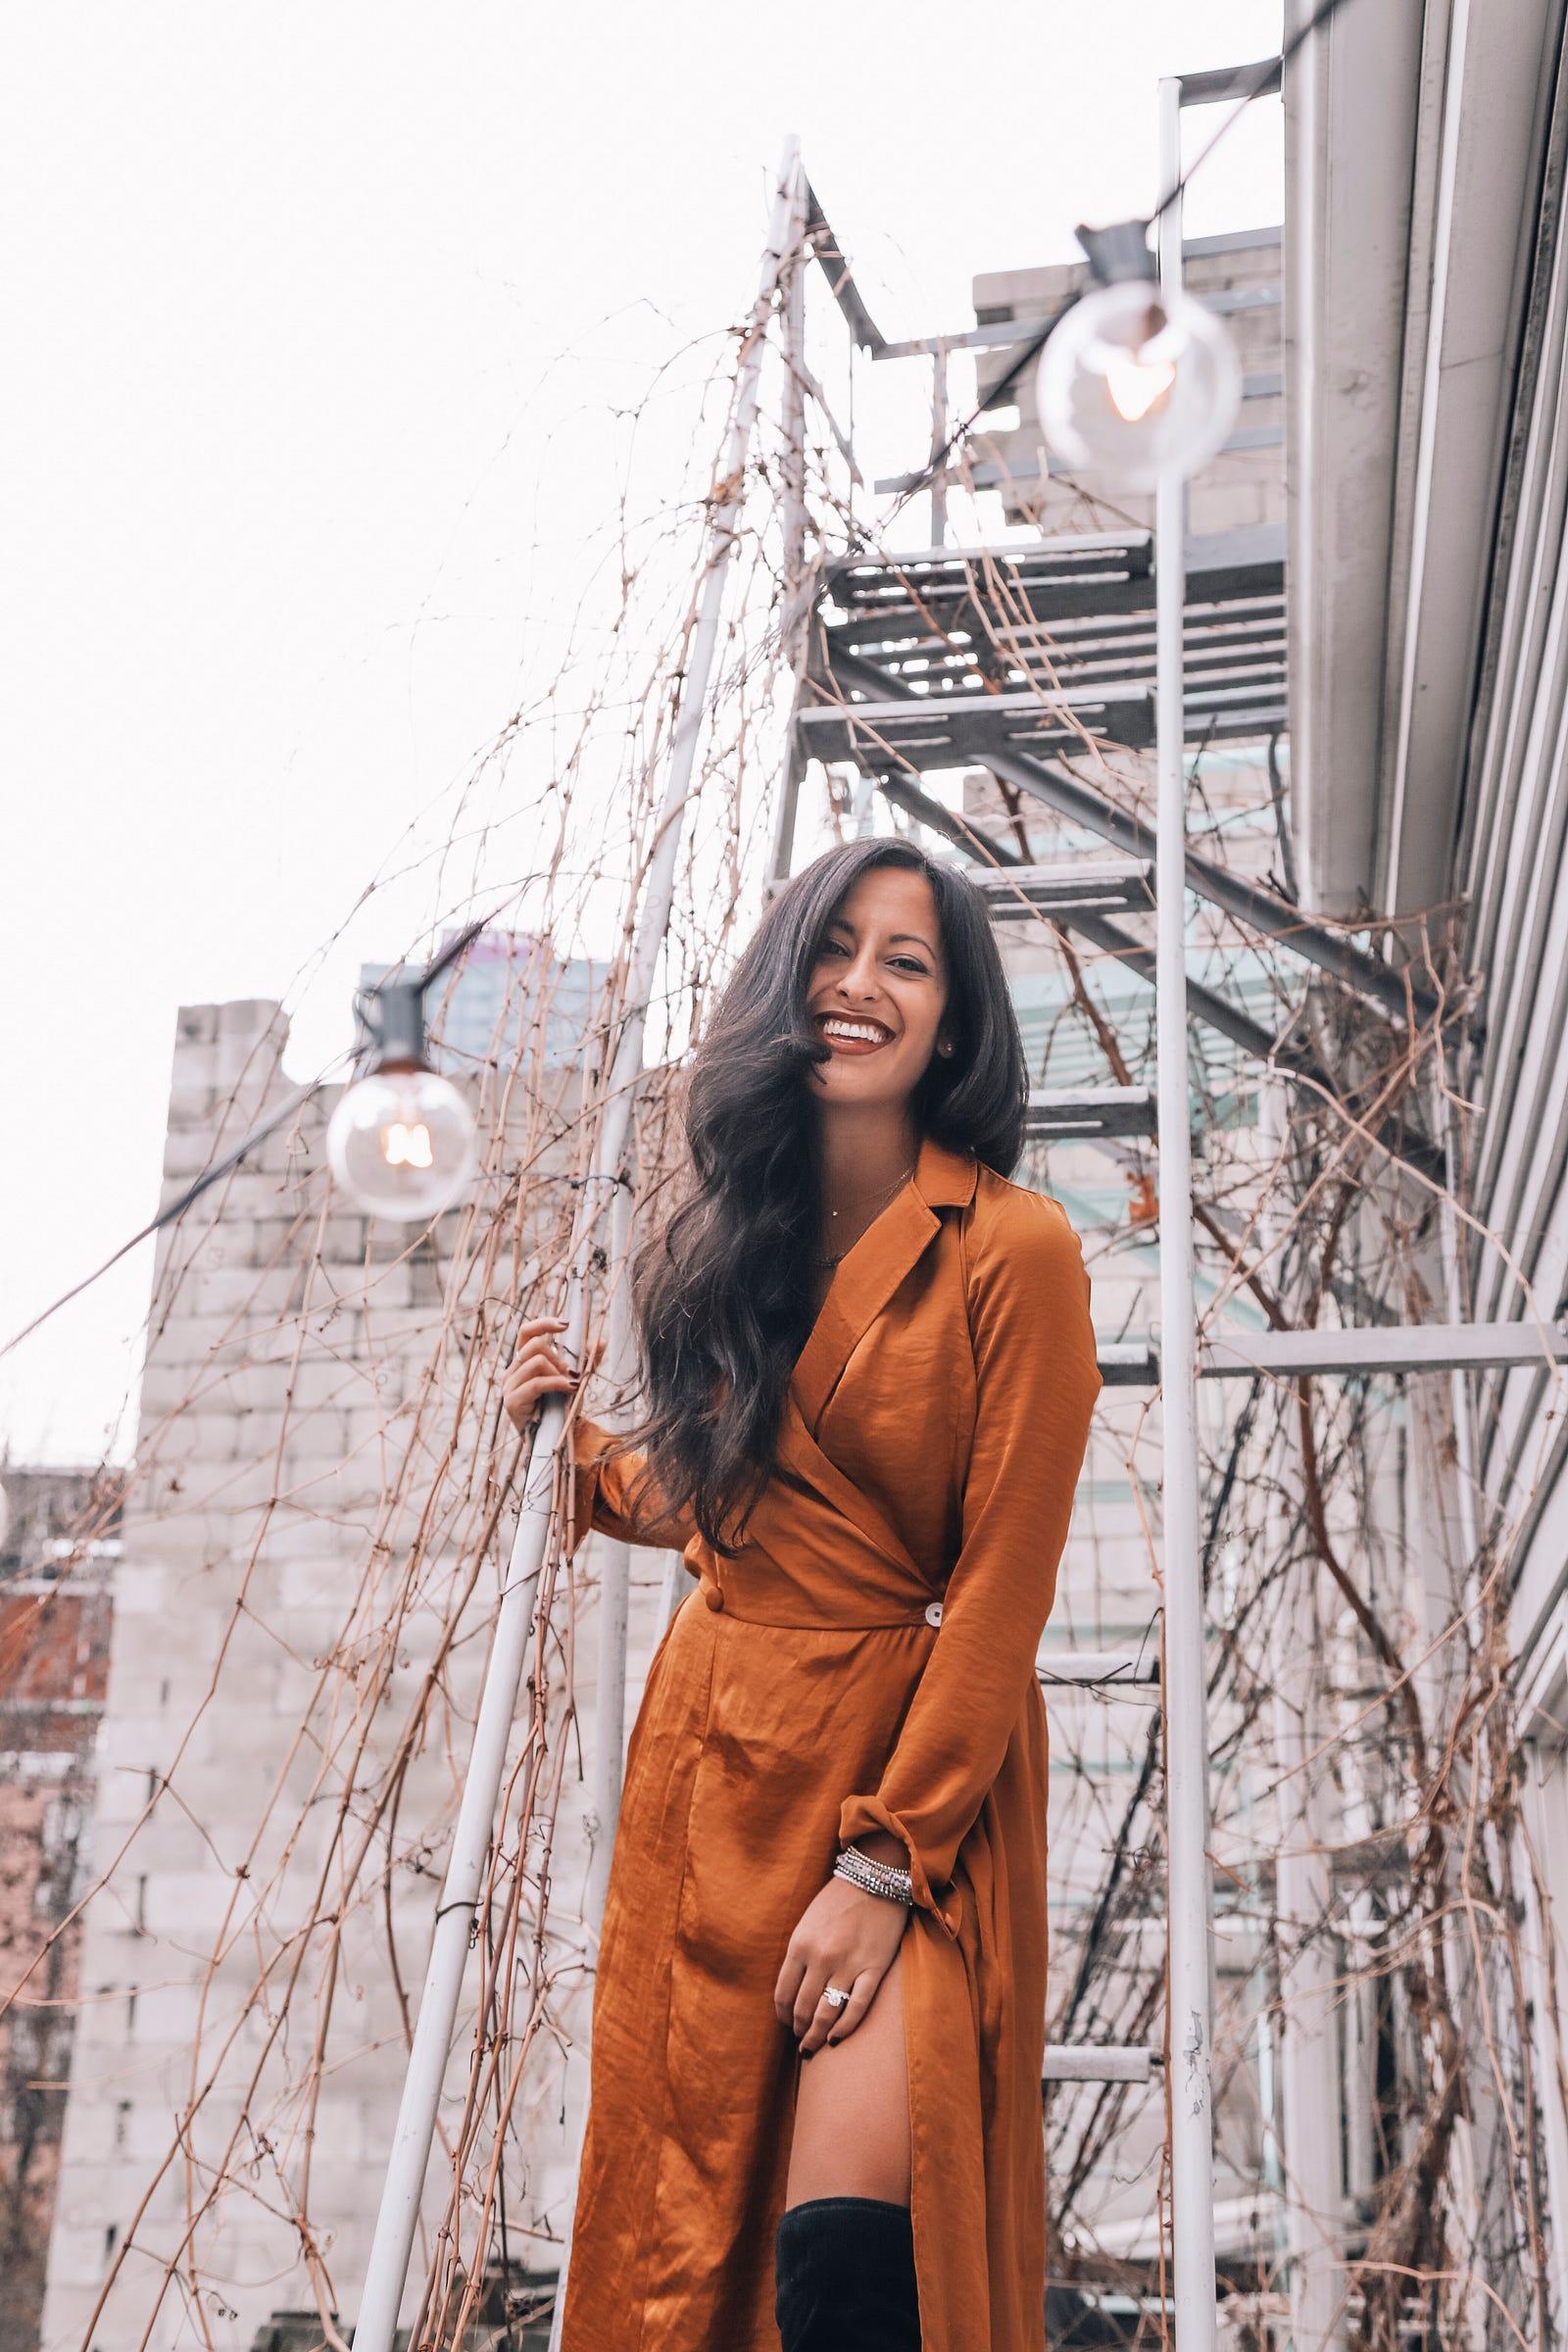 Adriana Carrig (Botti), the founder of Little Words Project wearing Bastet Noir's marigold shirt dress